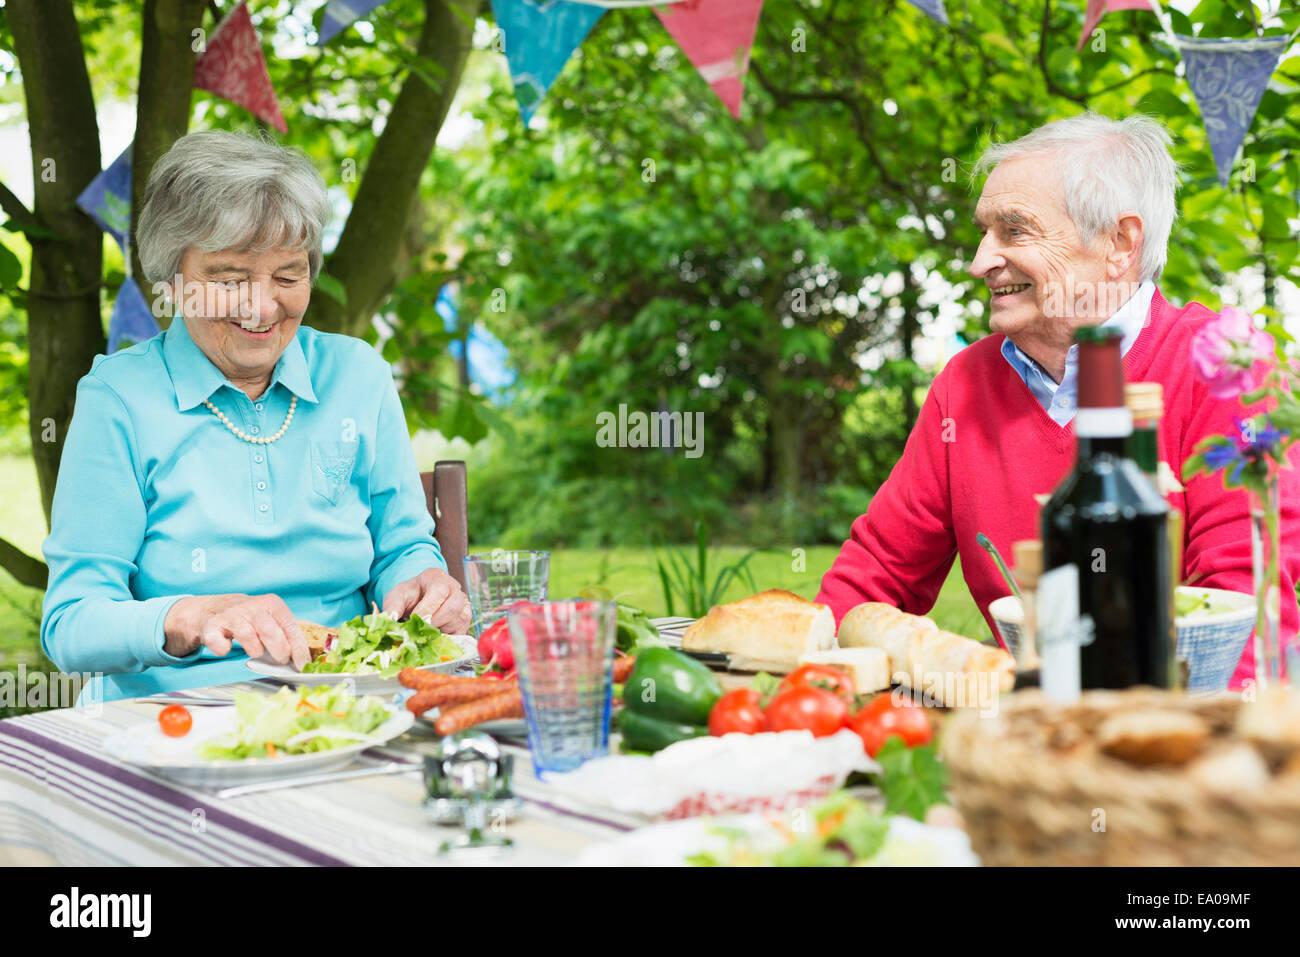 Älteres paar Essen Mittagessen unter freiem Himmel Stockbild